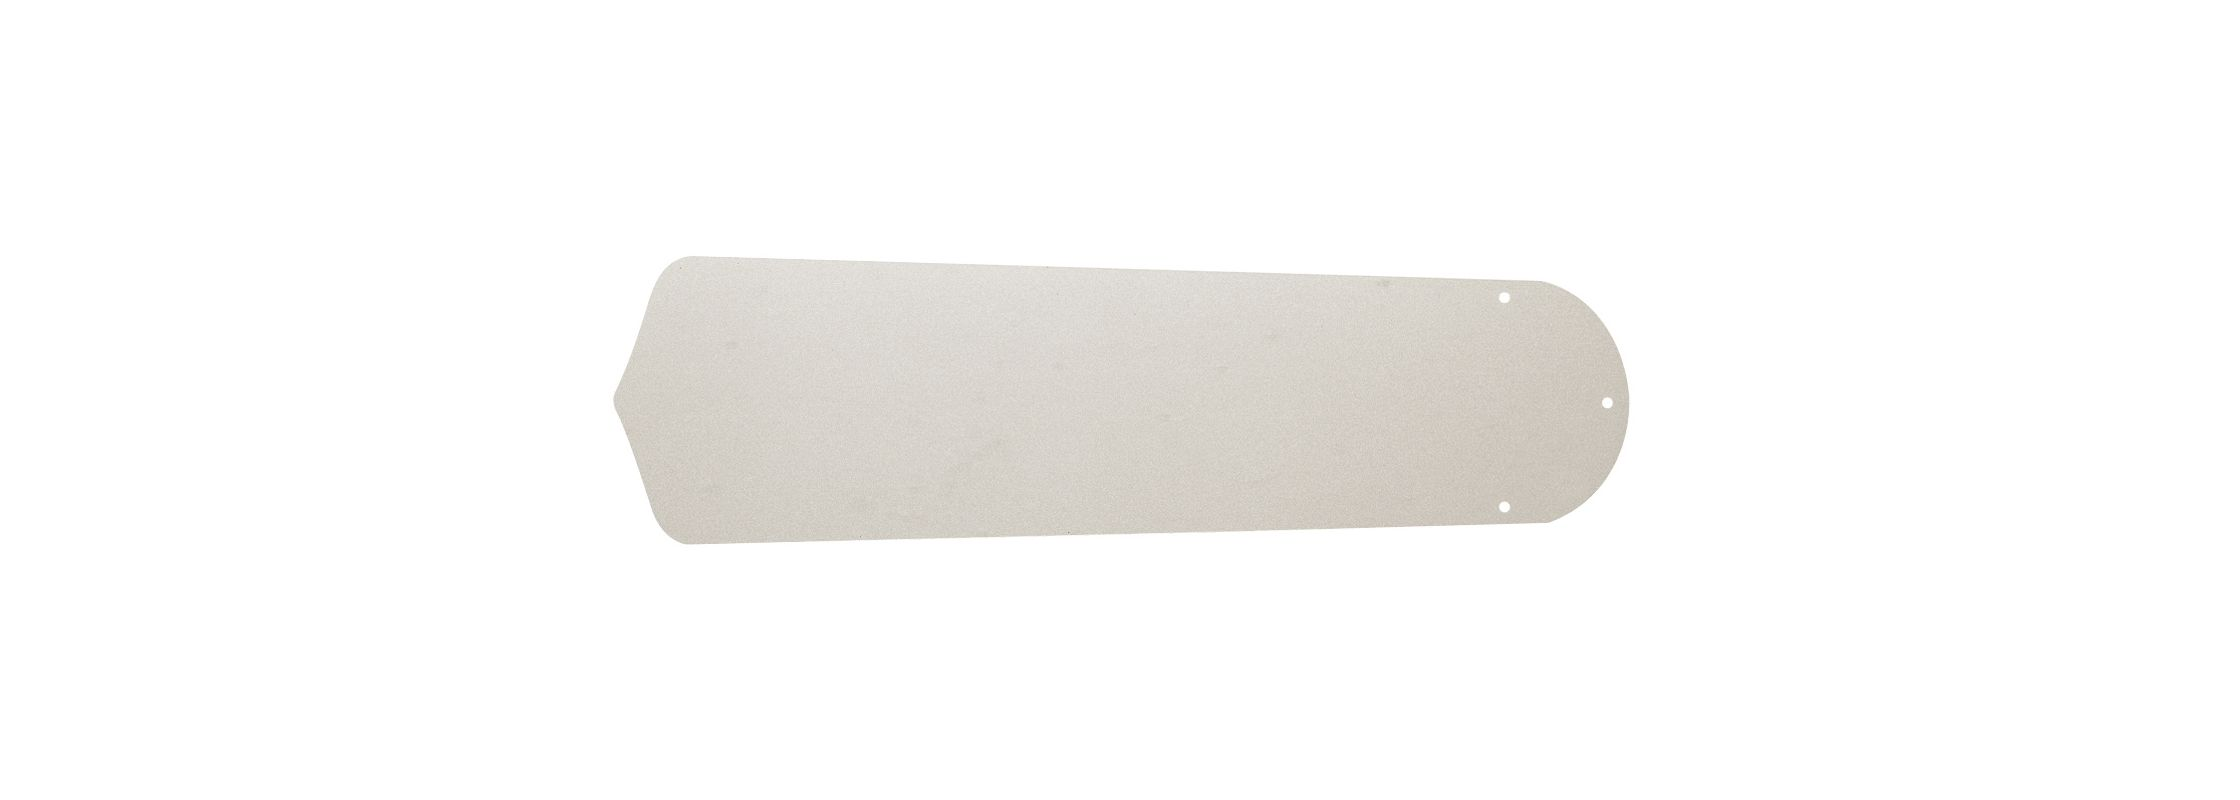 "Craftmade B552S Custom Wood 52"" (Pack of 5) White Ceiling Fan"